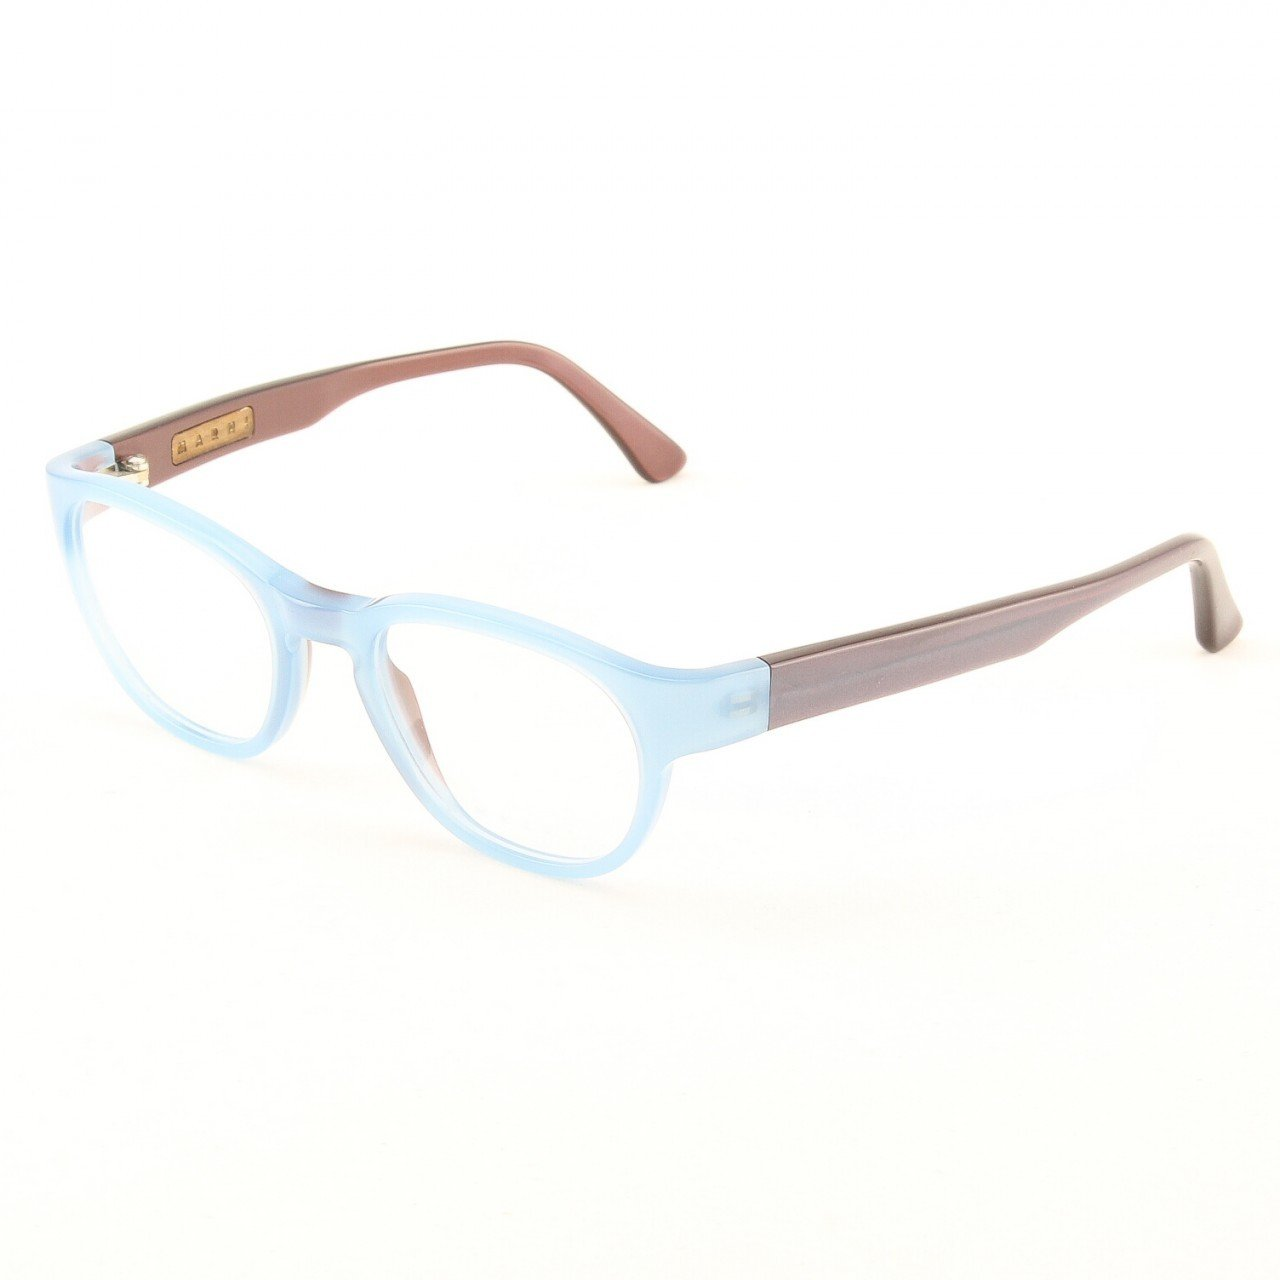 Marni MA630S Eyeglasses Col. 48 Crystal Light Blue Frame with Clear Lenses